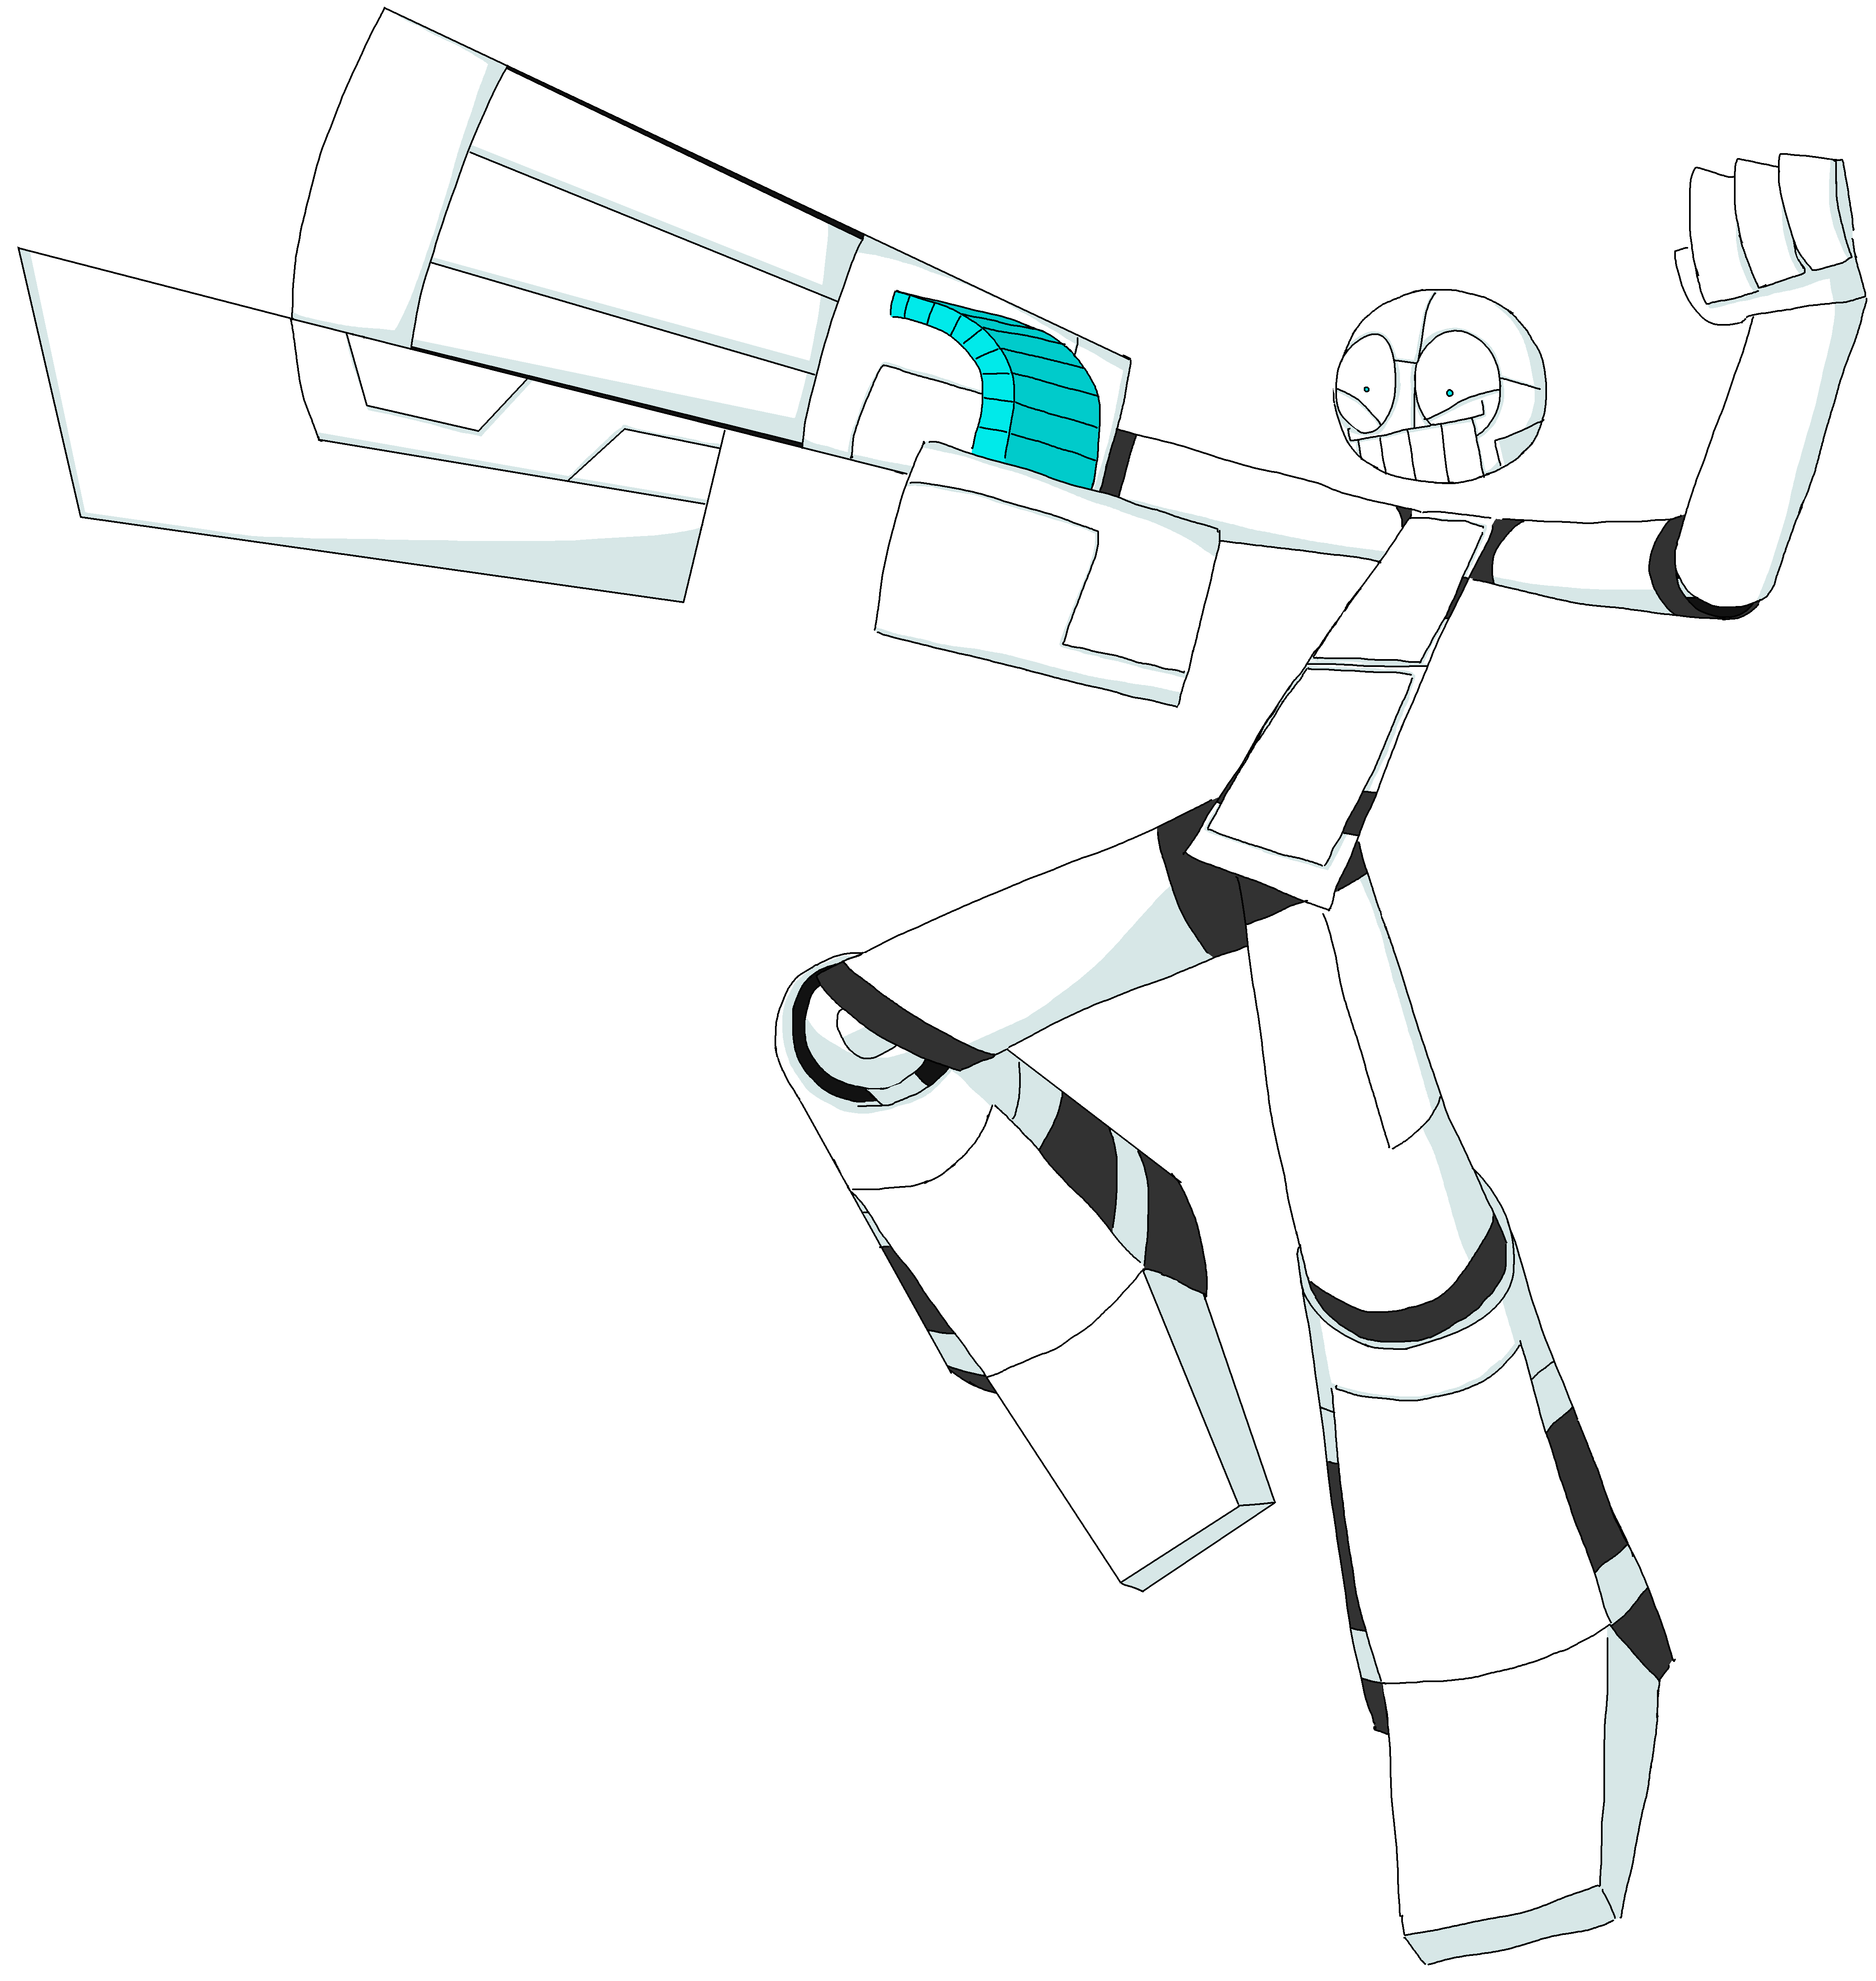 Gunbot 16/05/20